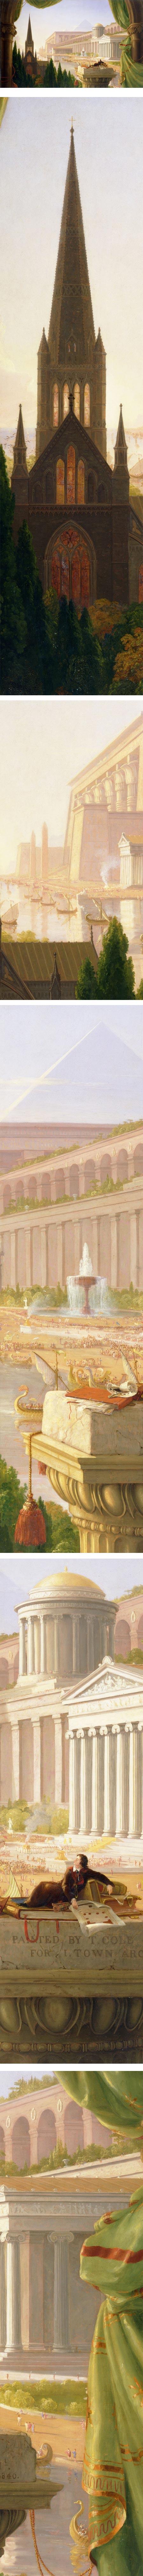 Architect's Dream, Thomas Cole